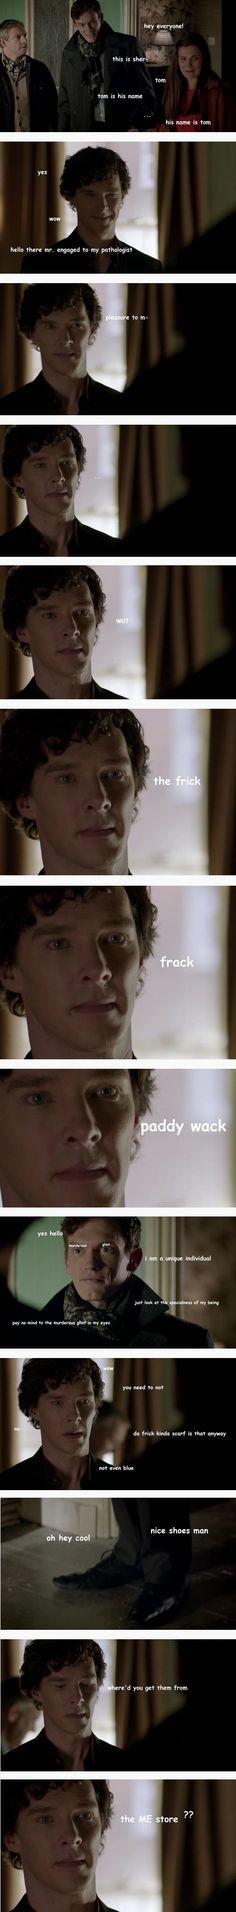 OMG!! I love: wut.. the frick... frack... paddy wack...